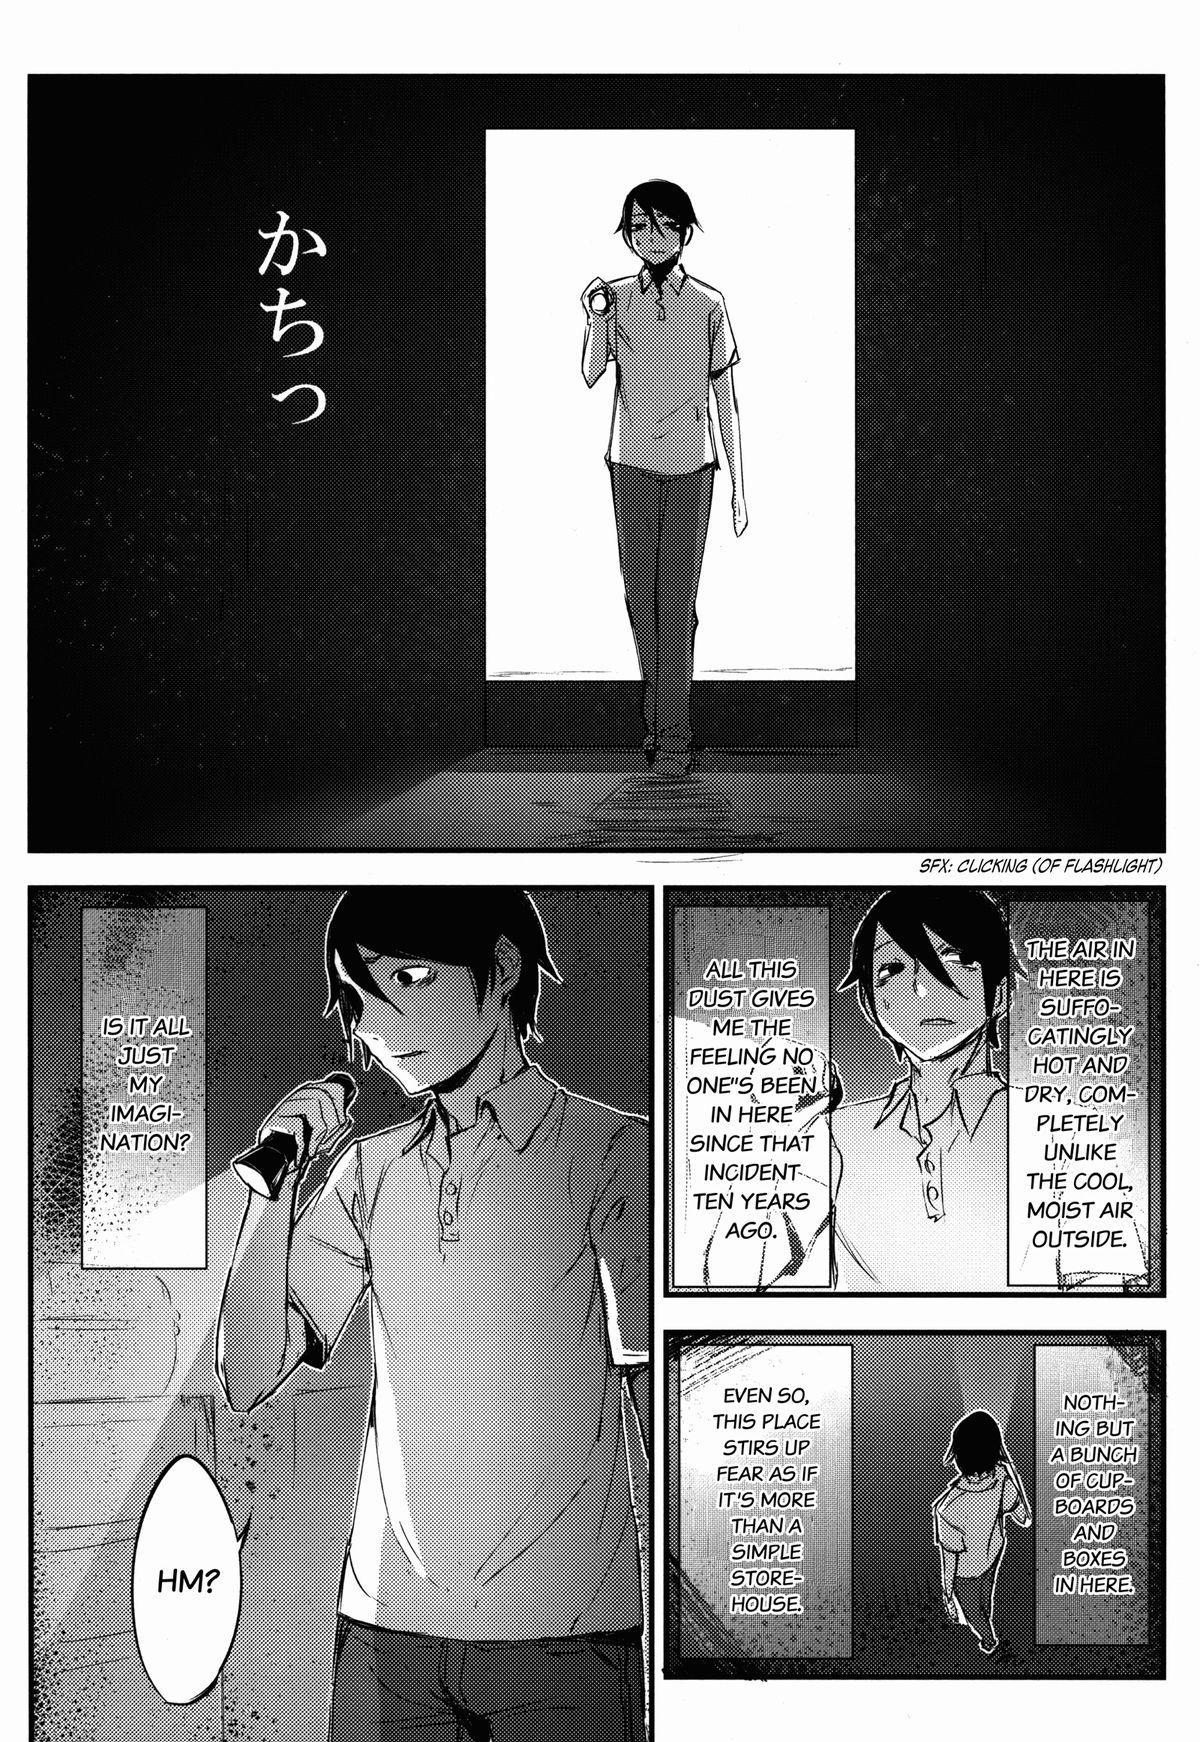 (COMIC1☆9) [Sakekan Memorial (SOLOPIPB)] Shiragasane -Tamoto-   Layers of White 2 [English] [rampantserenity] 6